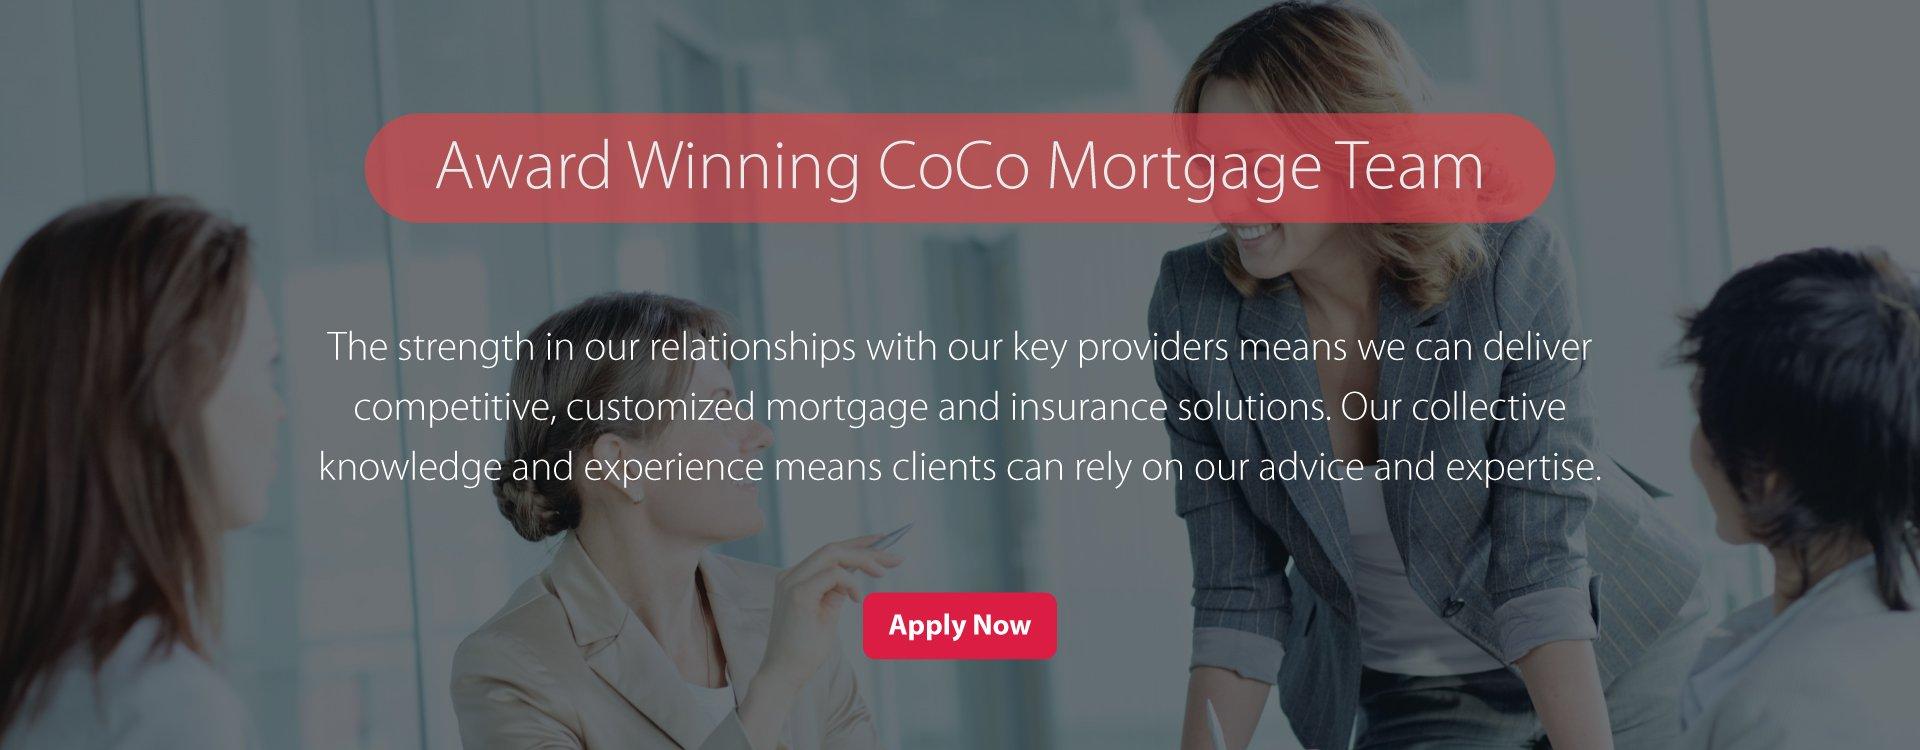 CoCo Mortgage Award Winning Team